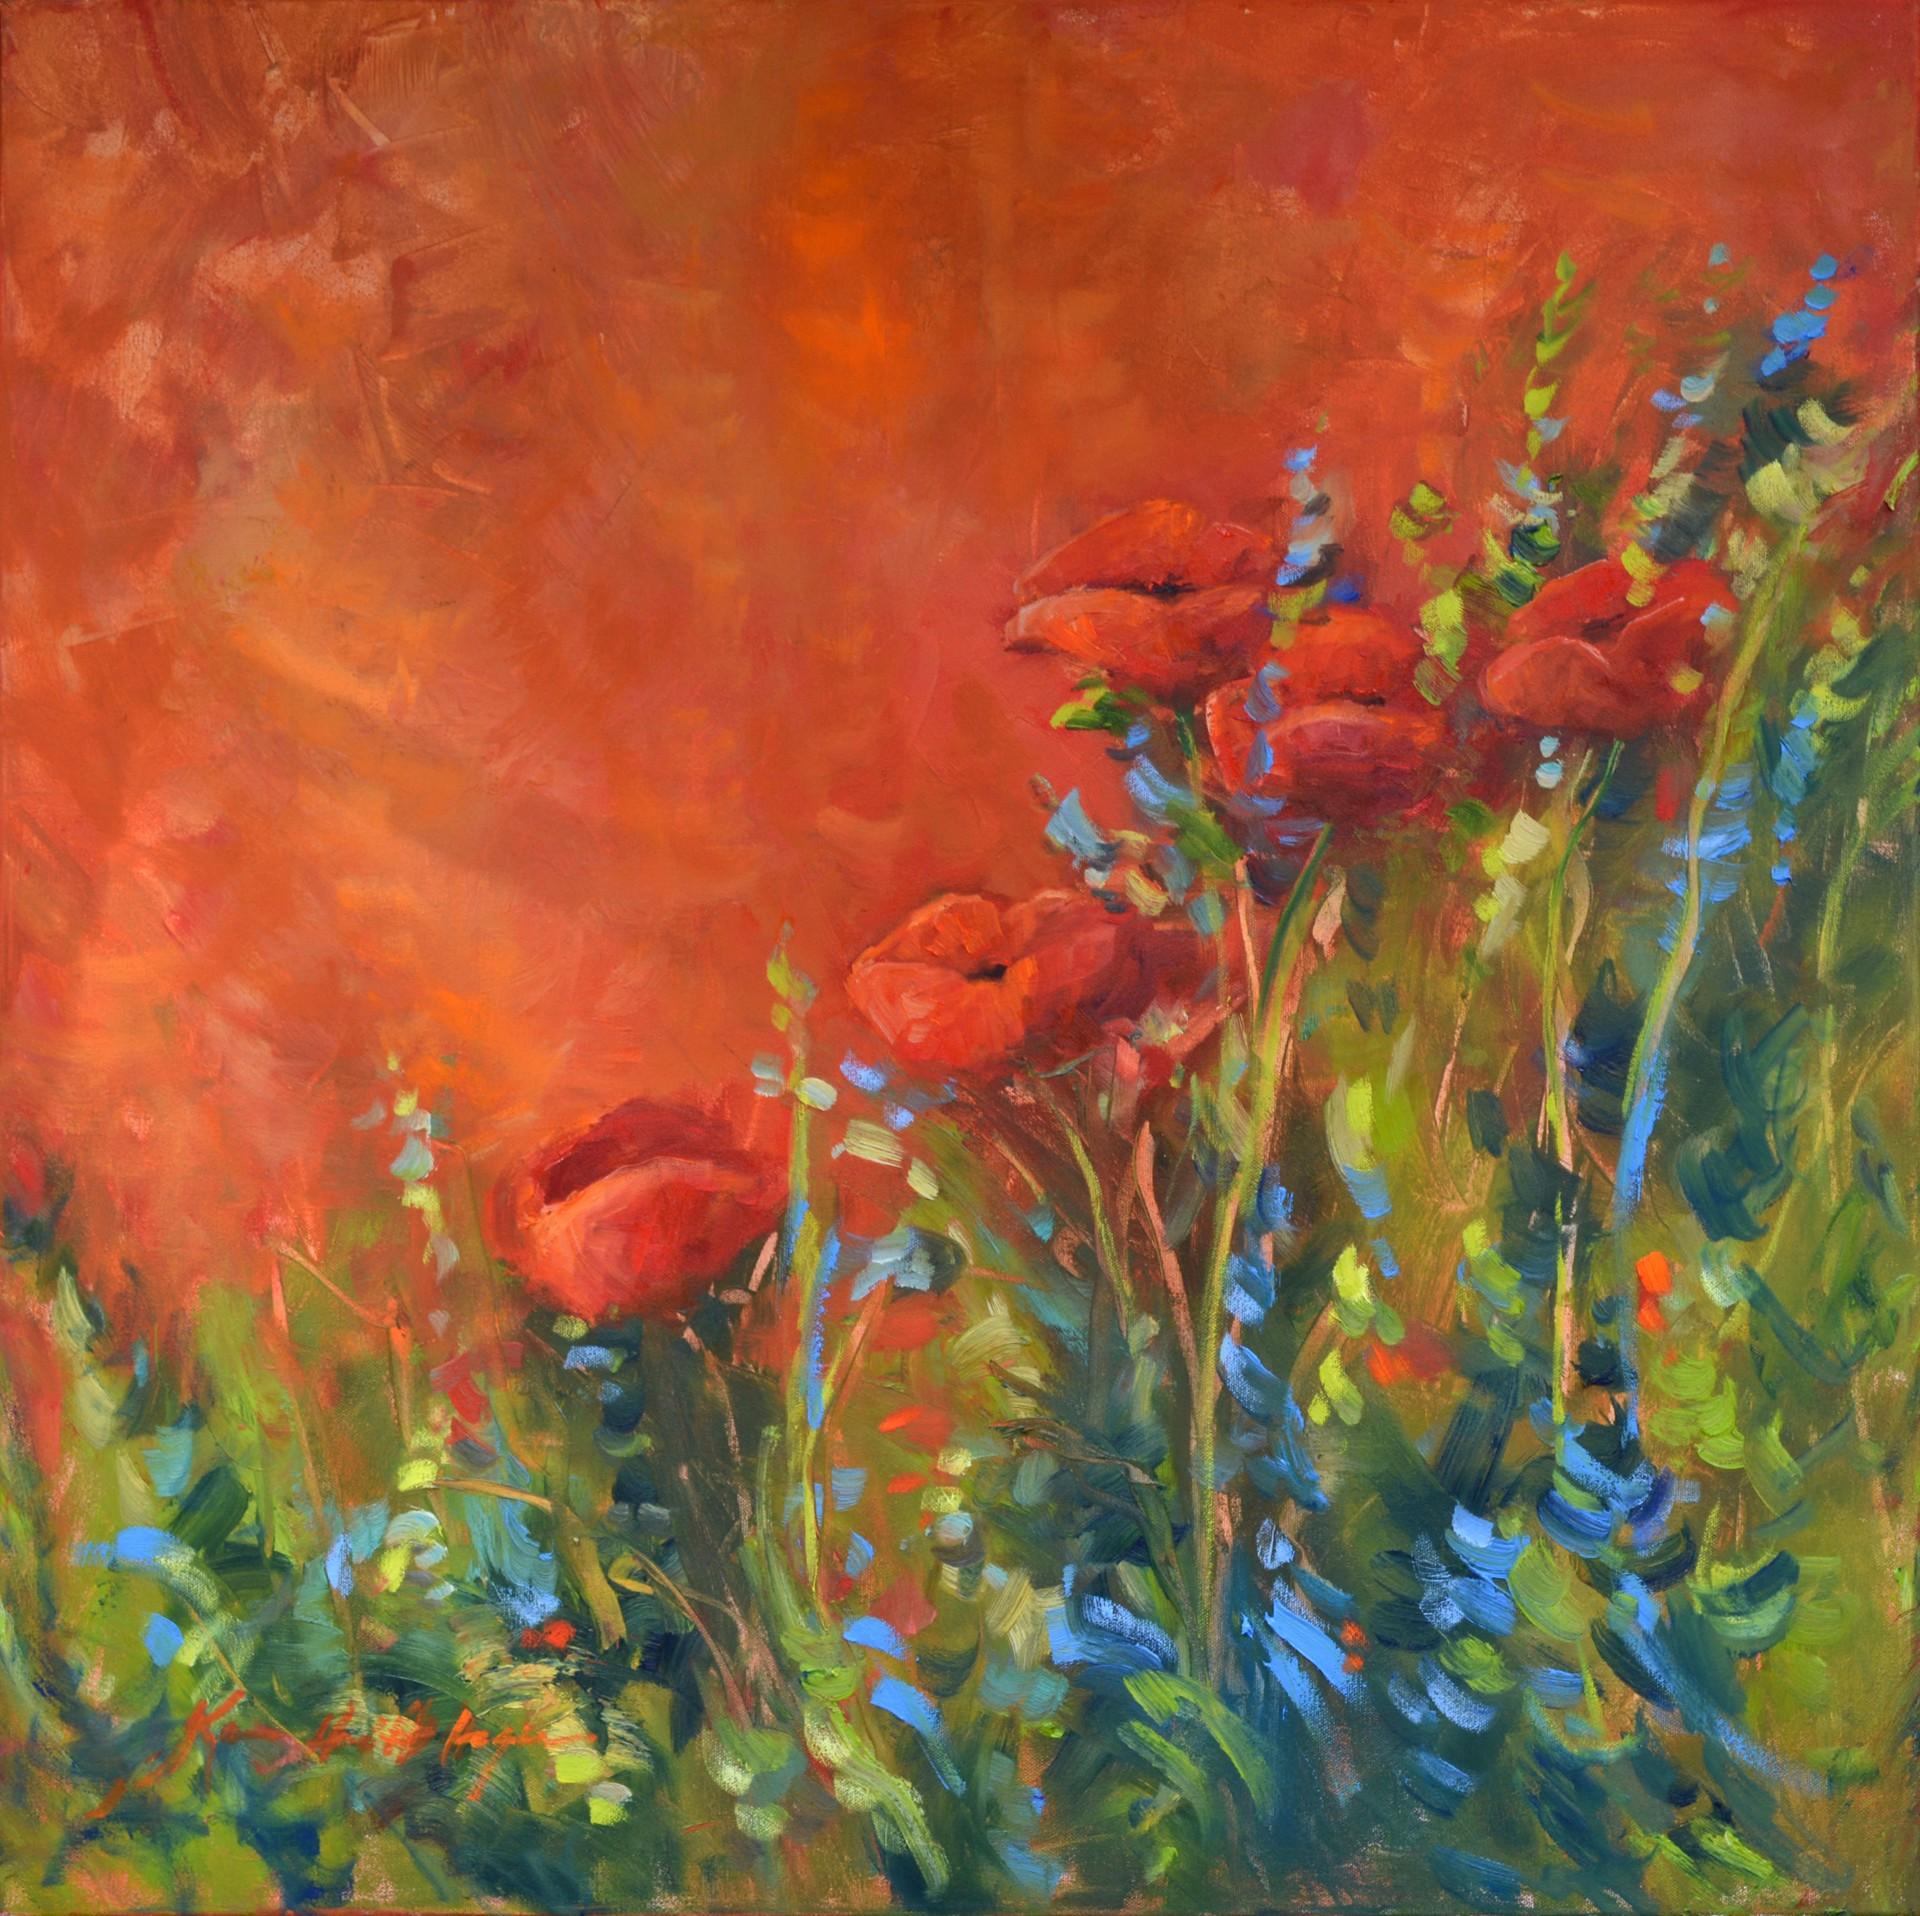 Full Bloom Italian Poppies by Karen Hewitt Hagan